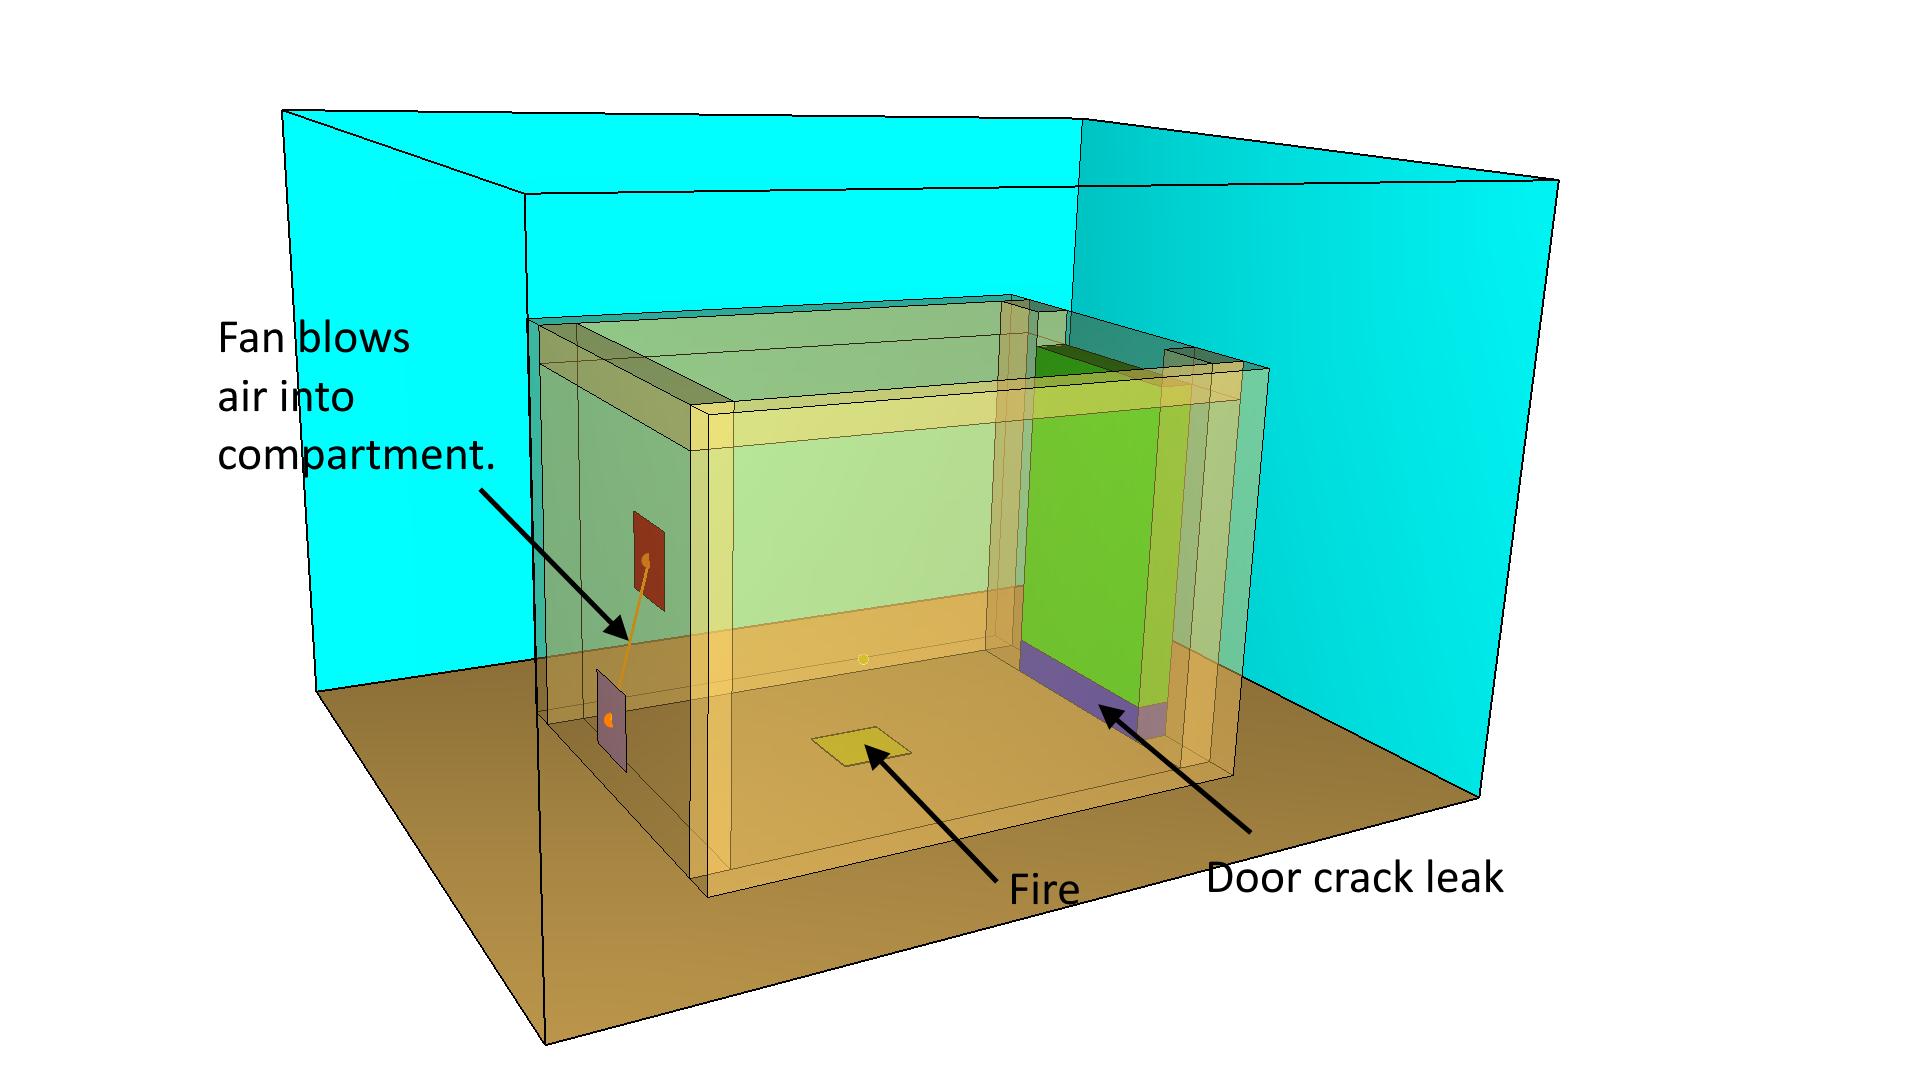 pyro scrn leakage door crack model